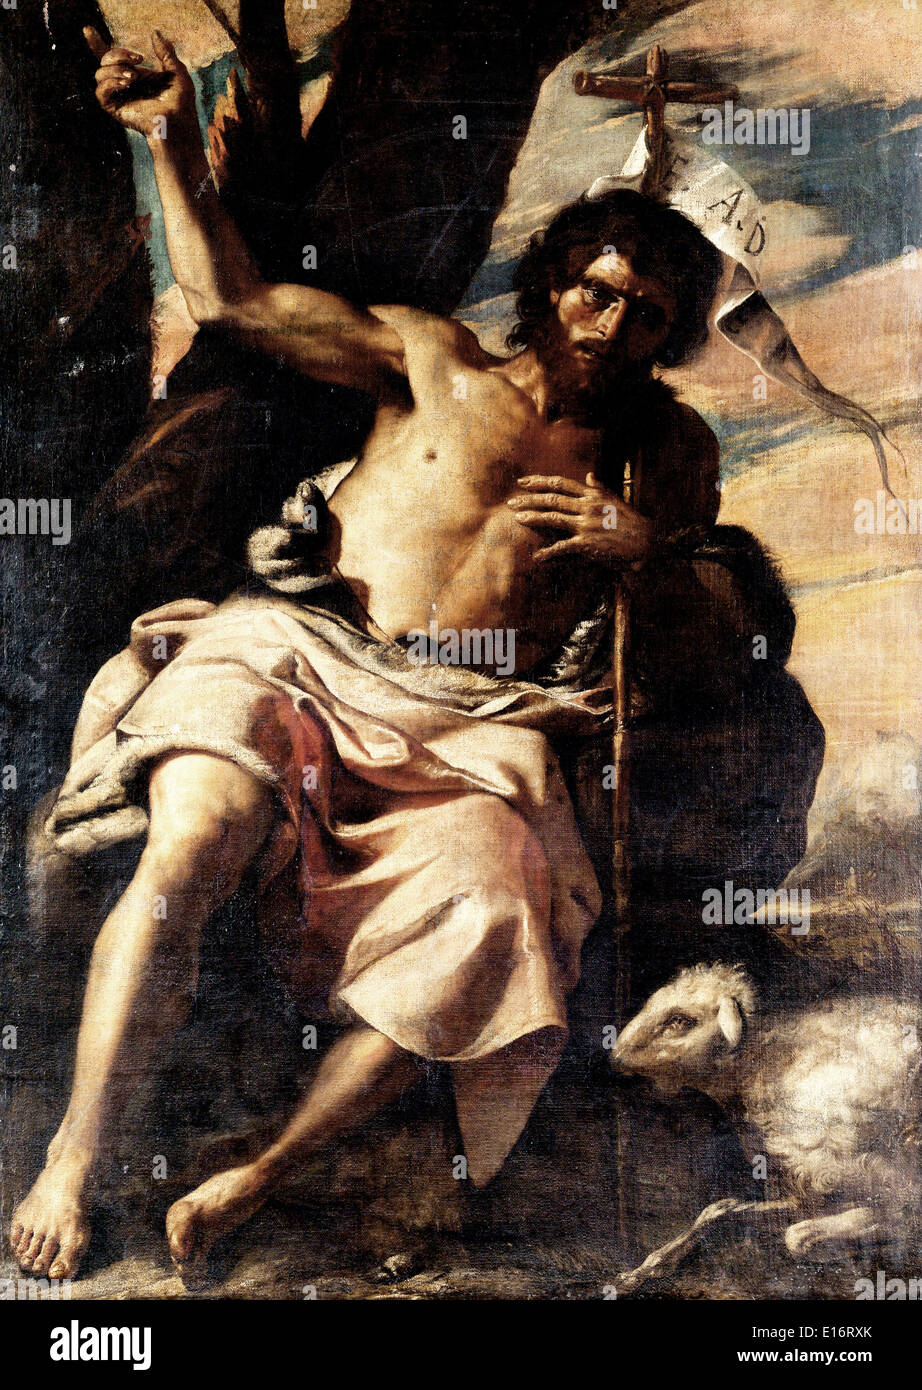 John the Baptist Preaching by Mattia Preti - Stock Image